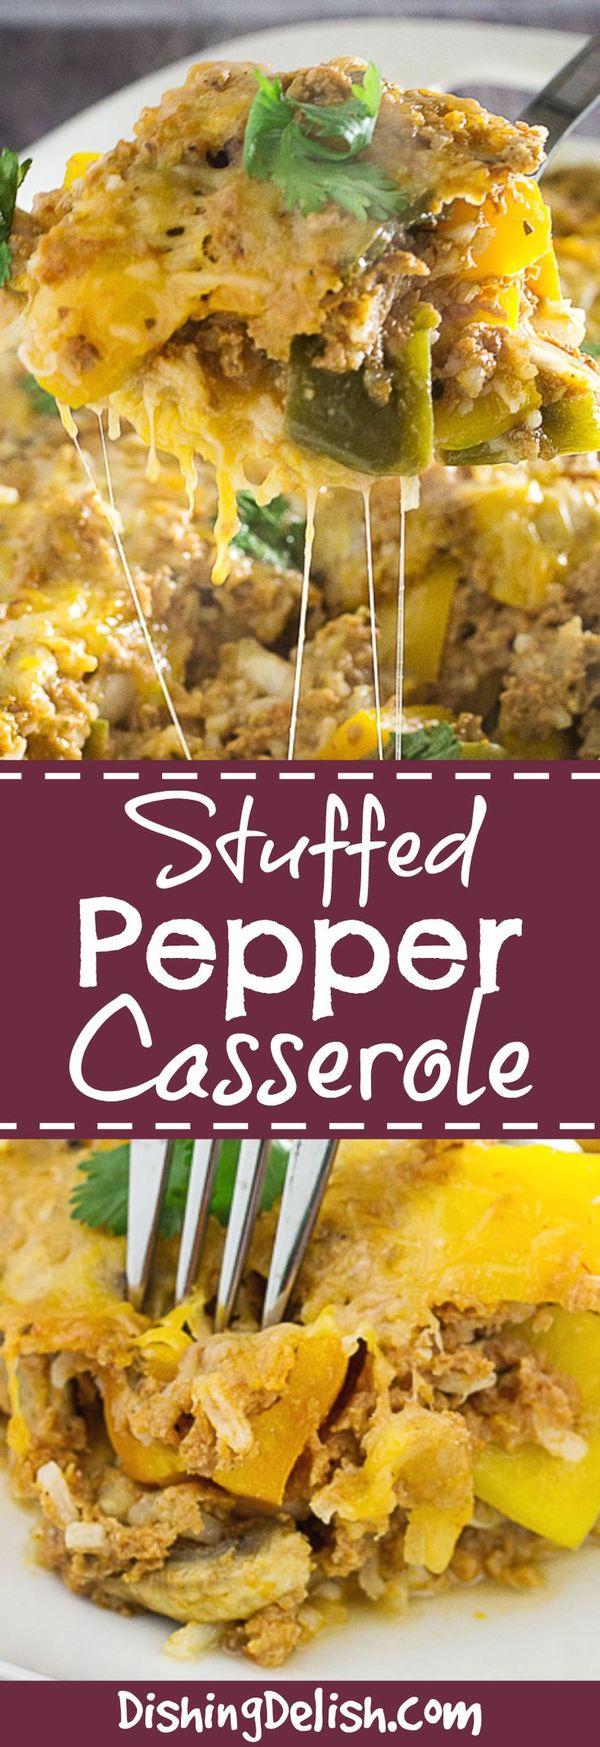 Cheesy Stuffed Pepper Casserole